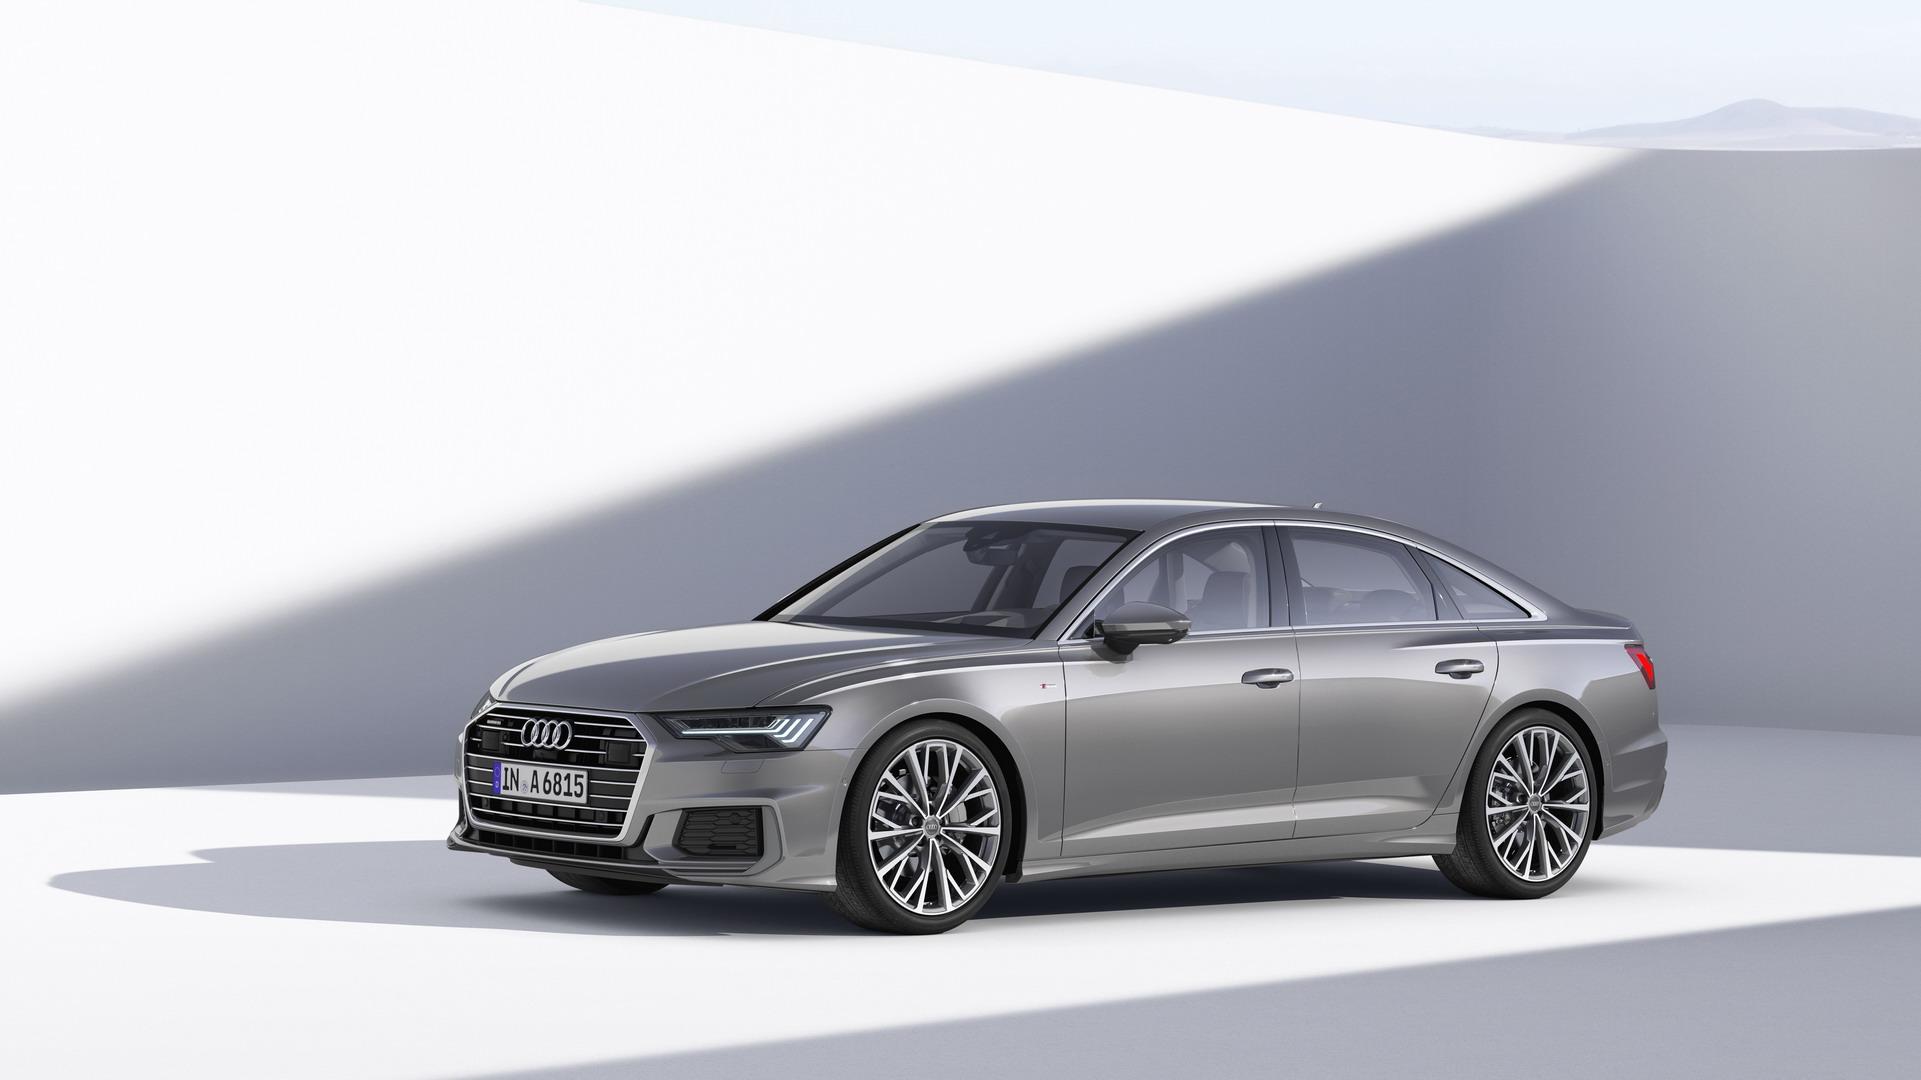 Audi A6 MY 2019